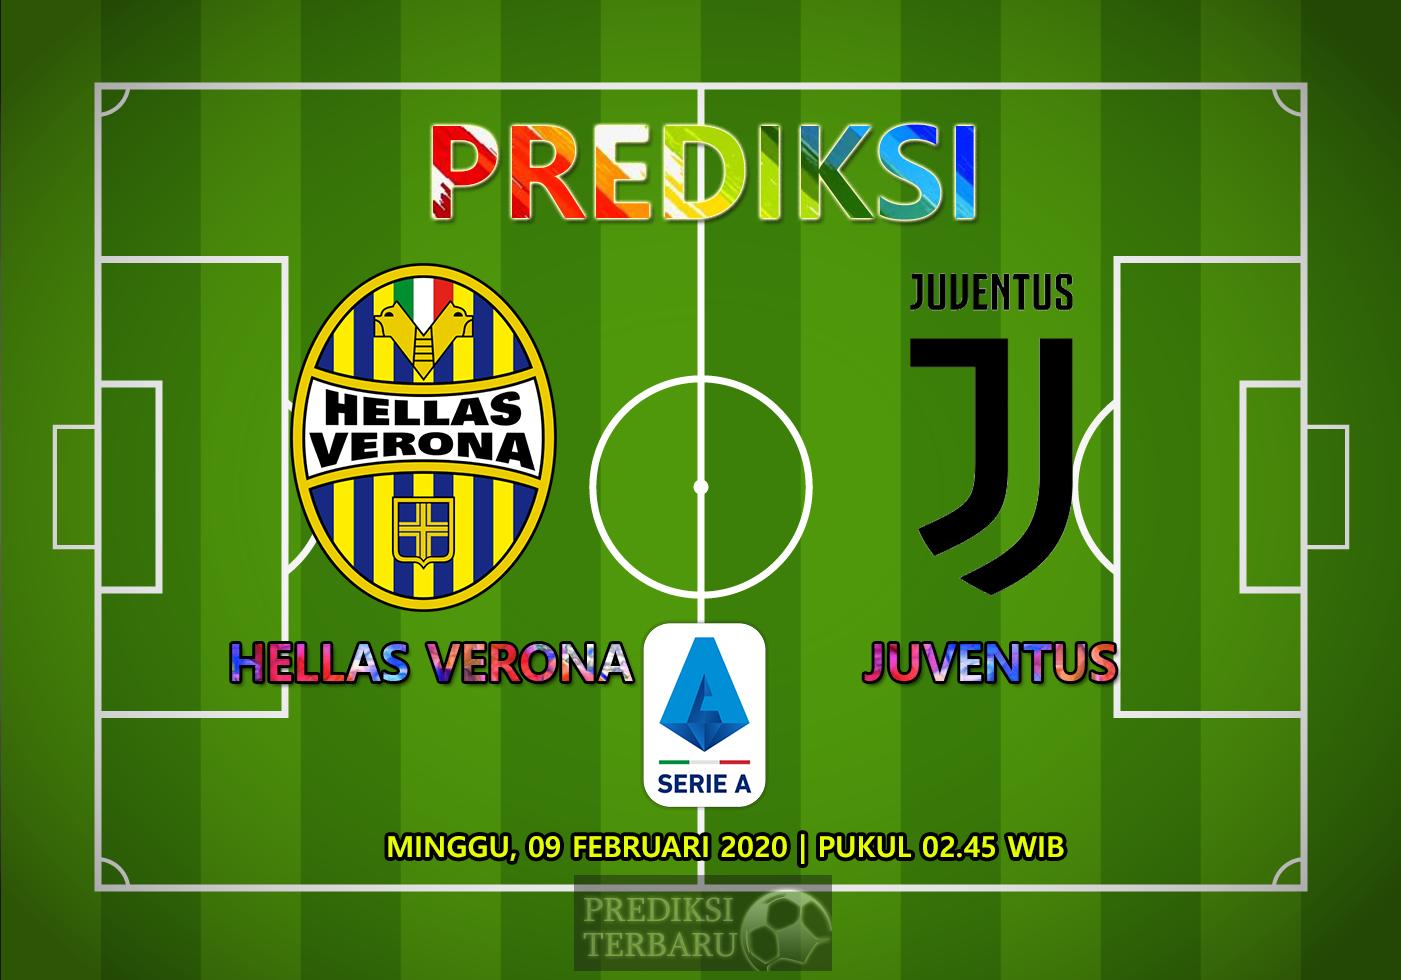 Prediksi Hellas Verona Vs Juventus 09 Februari